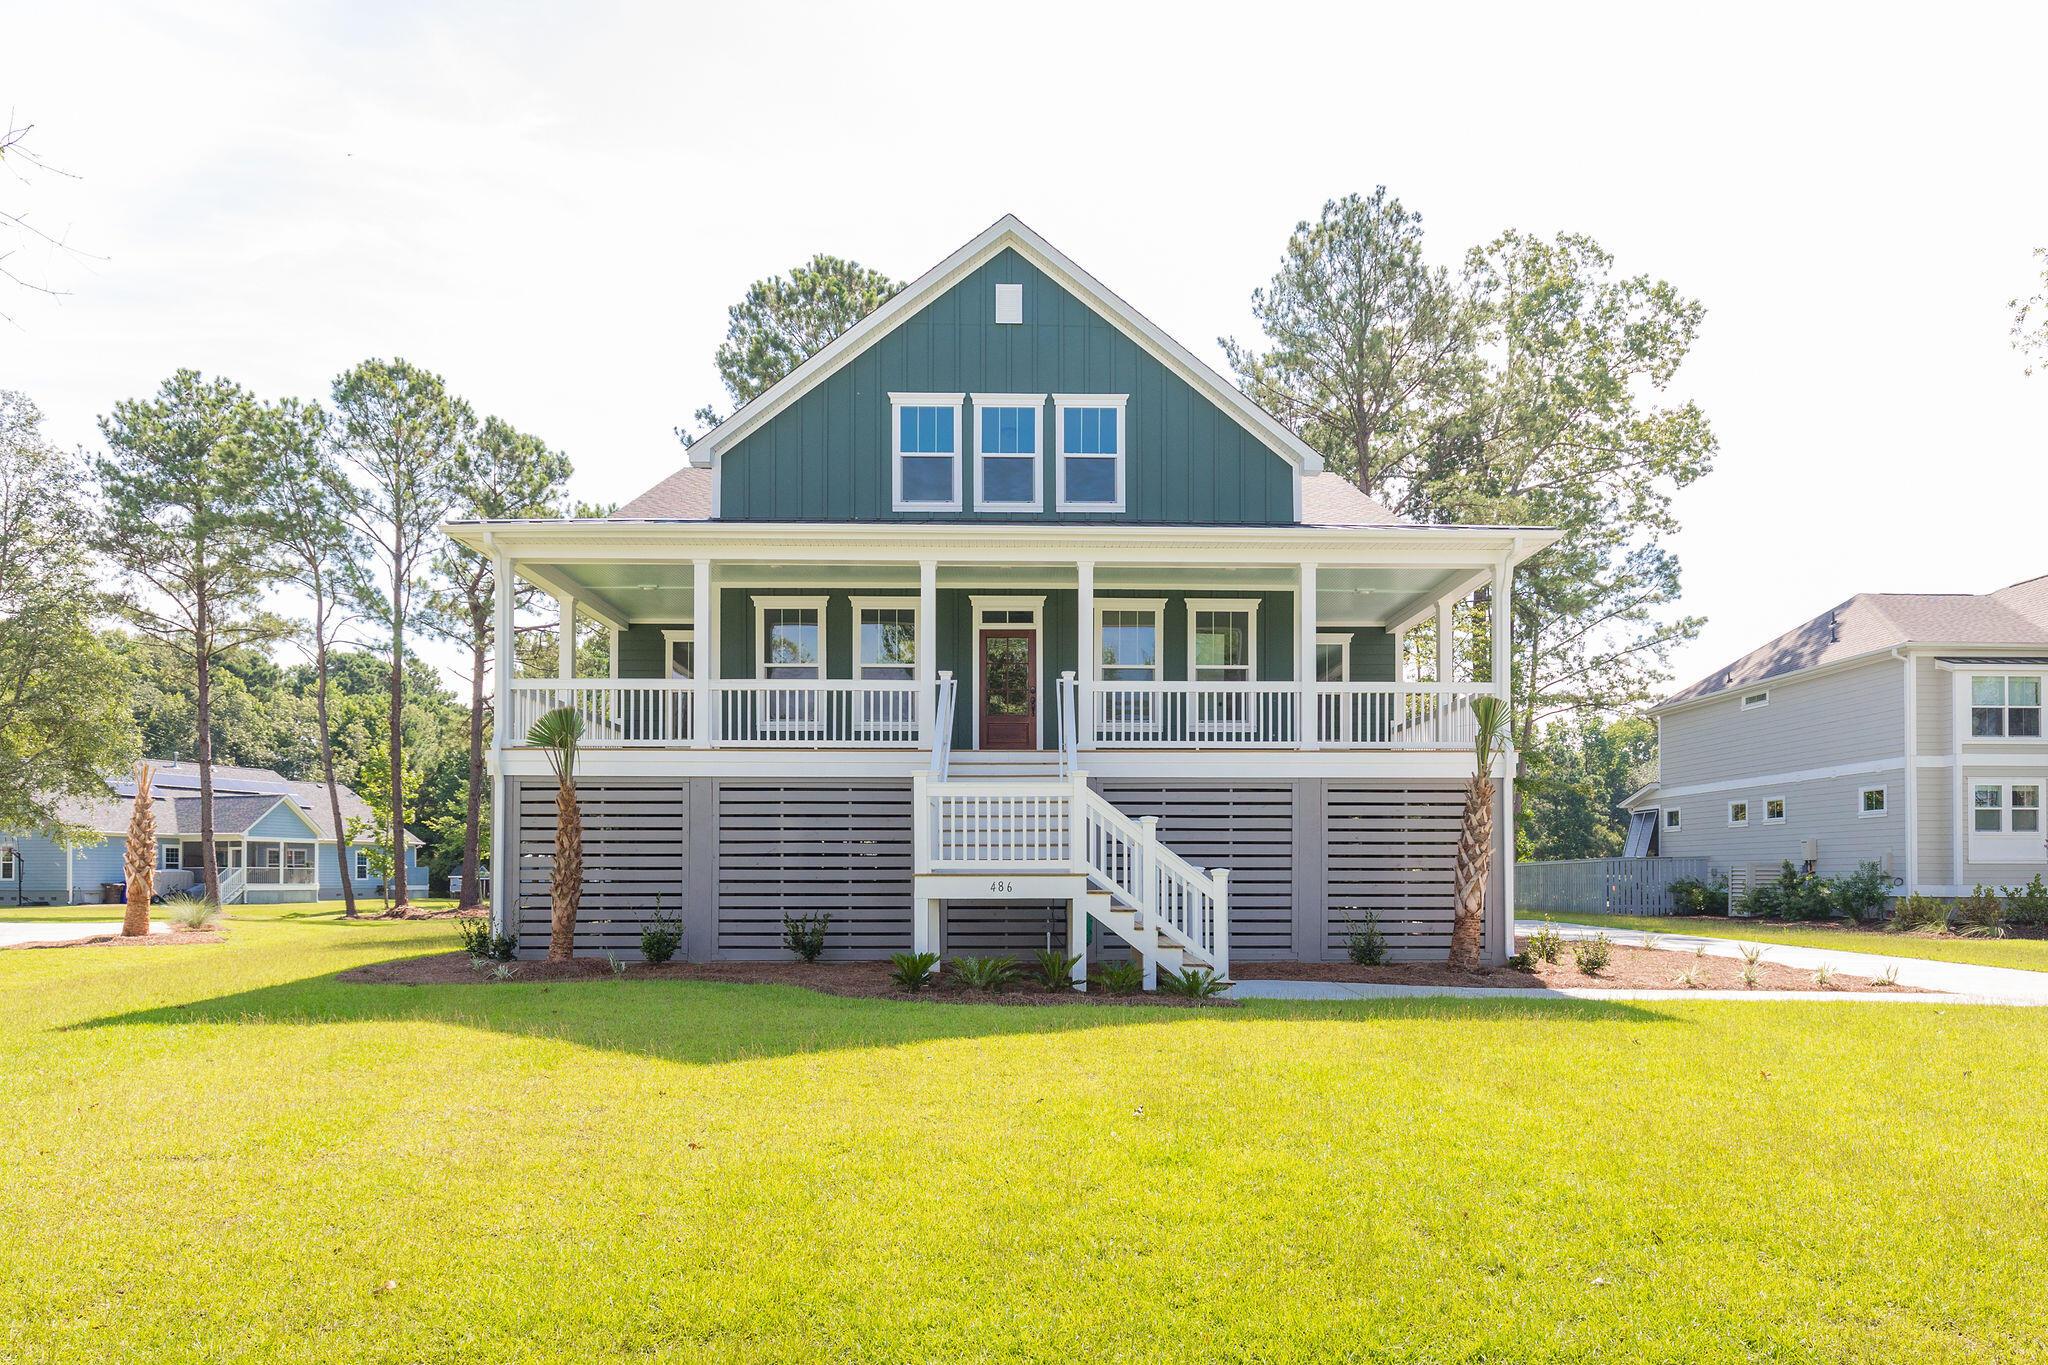 Rushland Plantation Homes For Sale - 2421 Rushland Landing, Johns Island, SC - 4